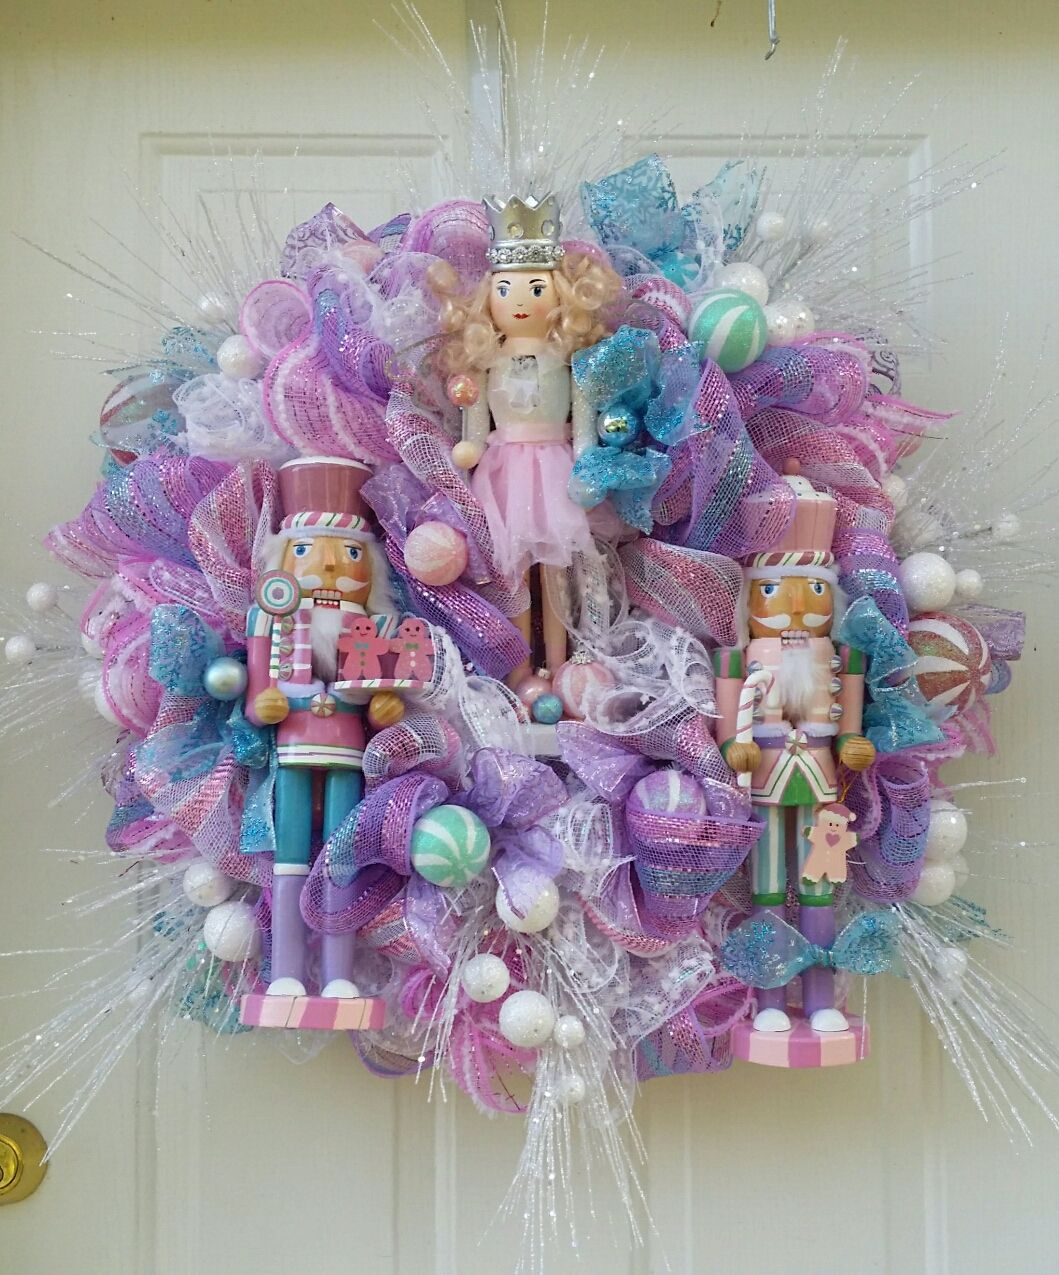 Nutcracker/Sugarplum Fairy Deco Mesh Wreath made by The Artful Diva Designs on Etsy and Facebook